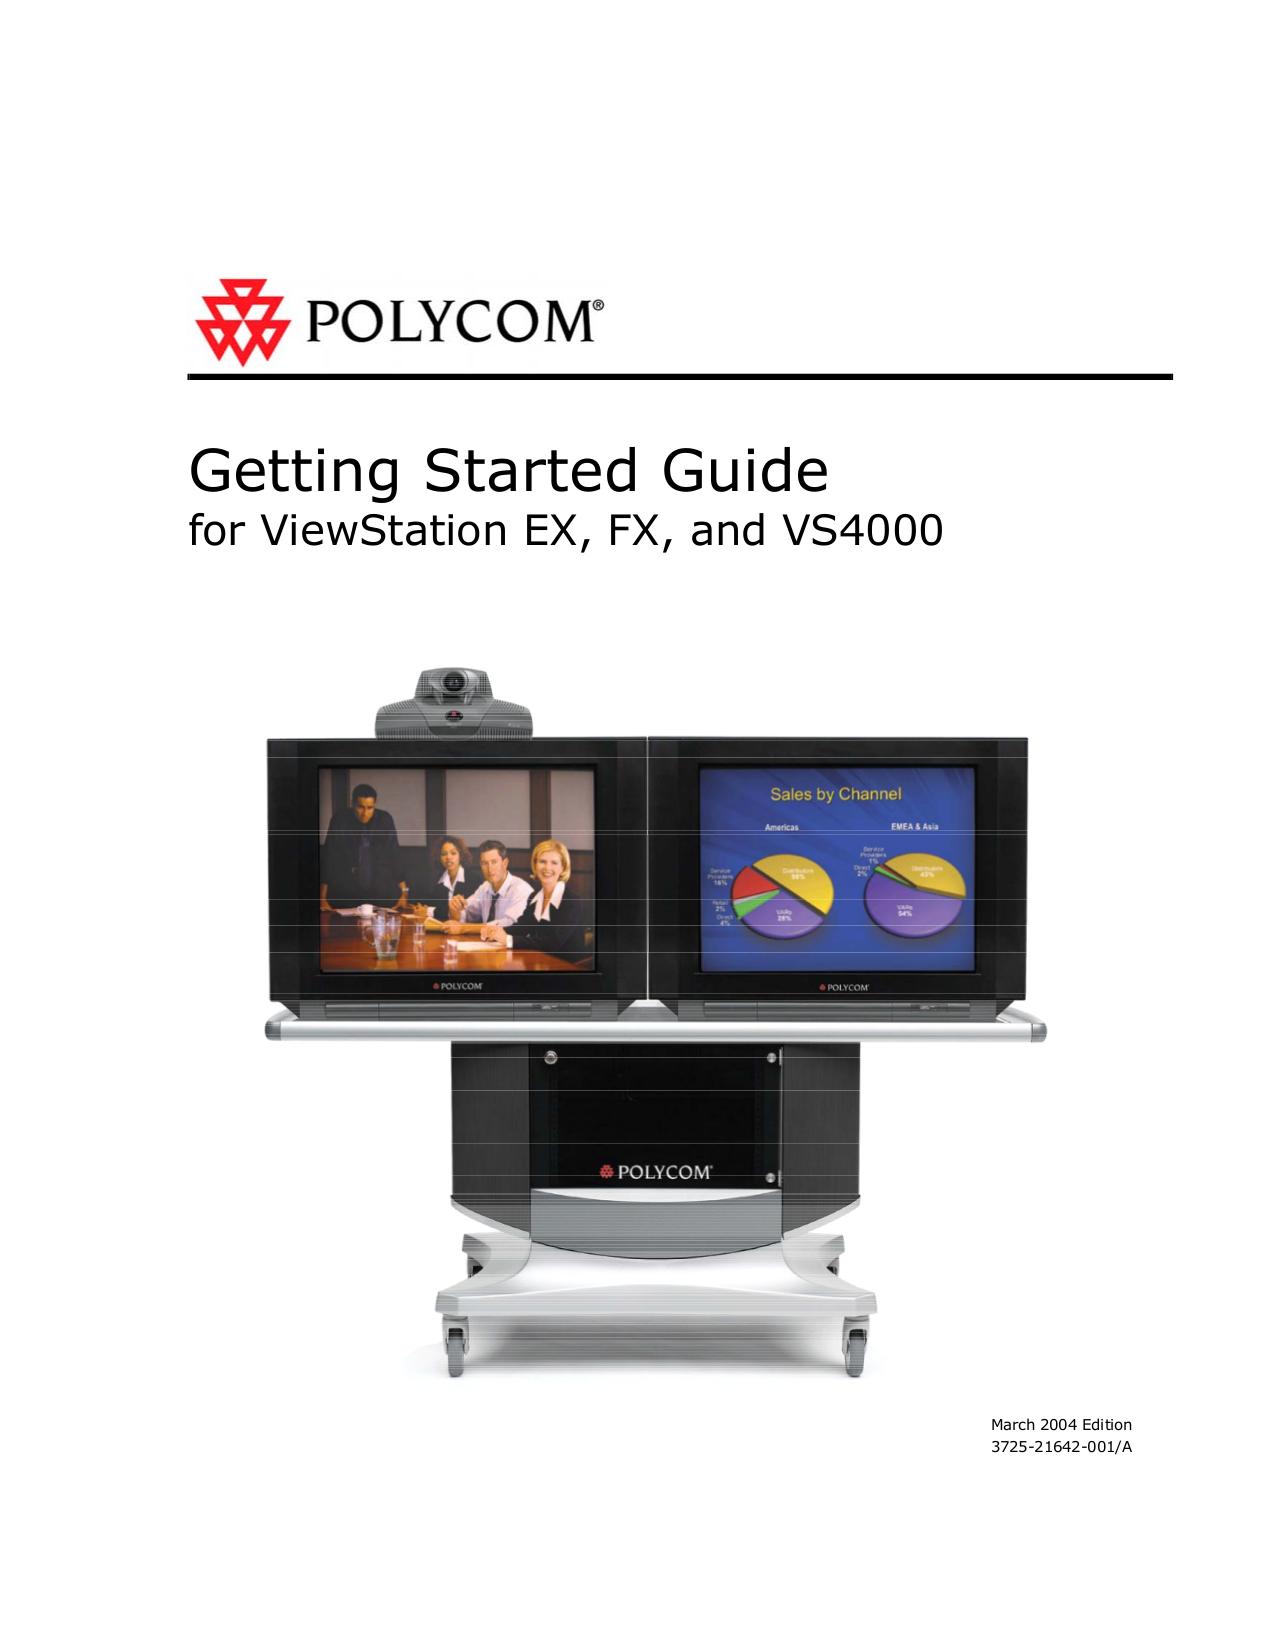 polycom vs4000 manual free owners manual u2022 rh wordworksbysea com Polycom PVS 14Xx Manual Polycom Capture Station